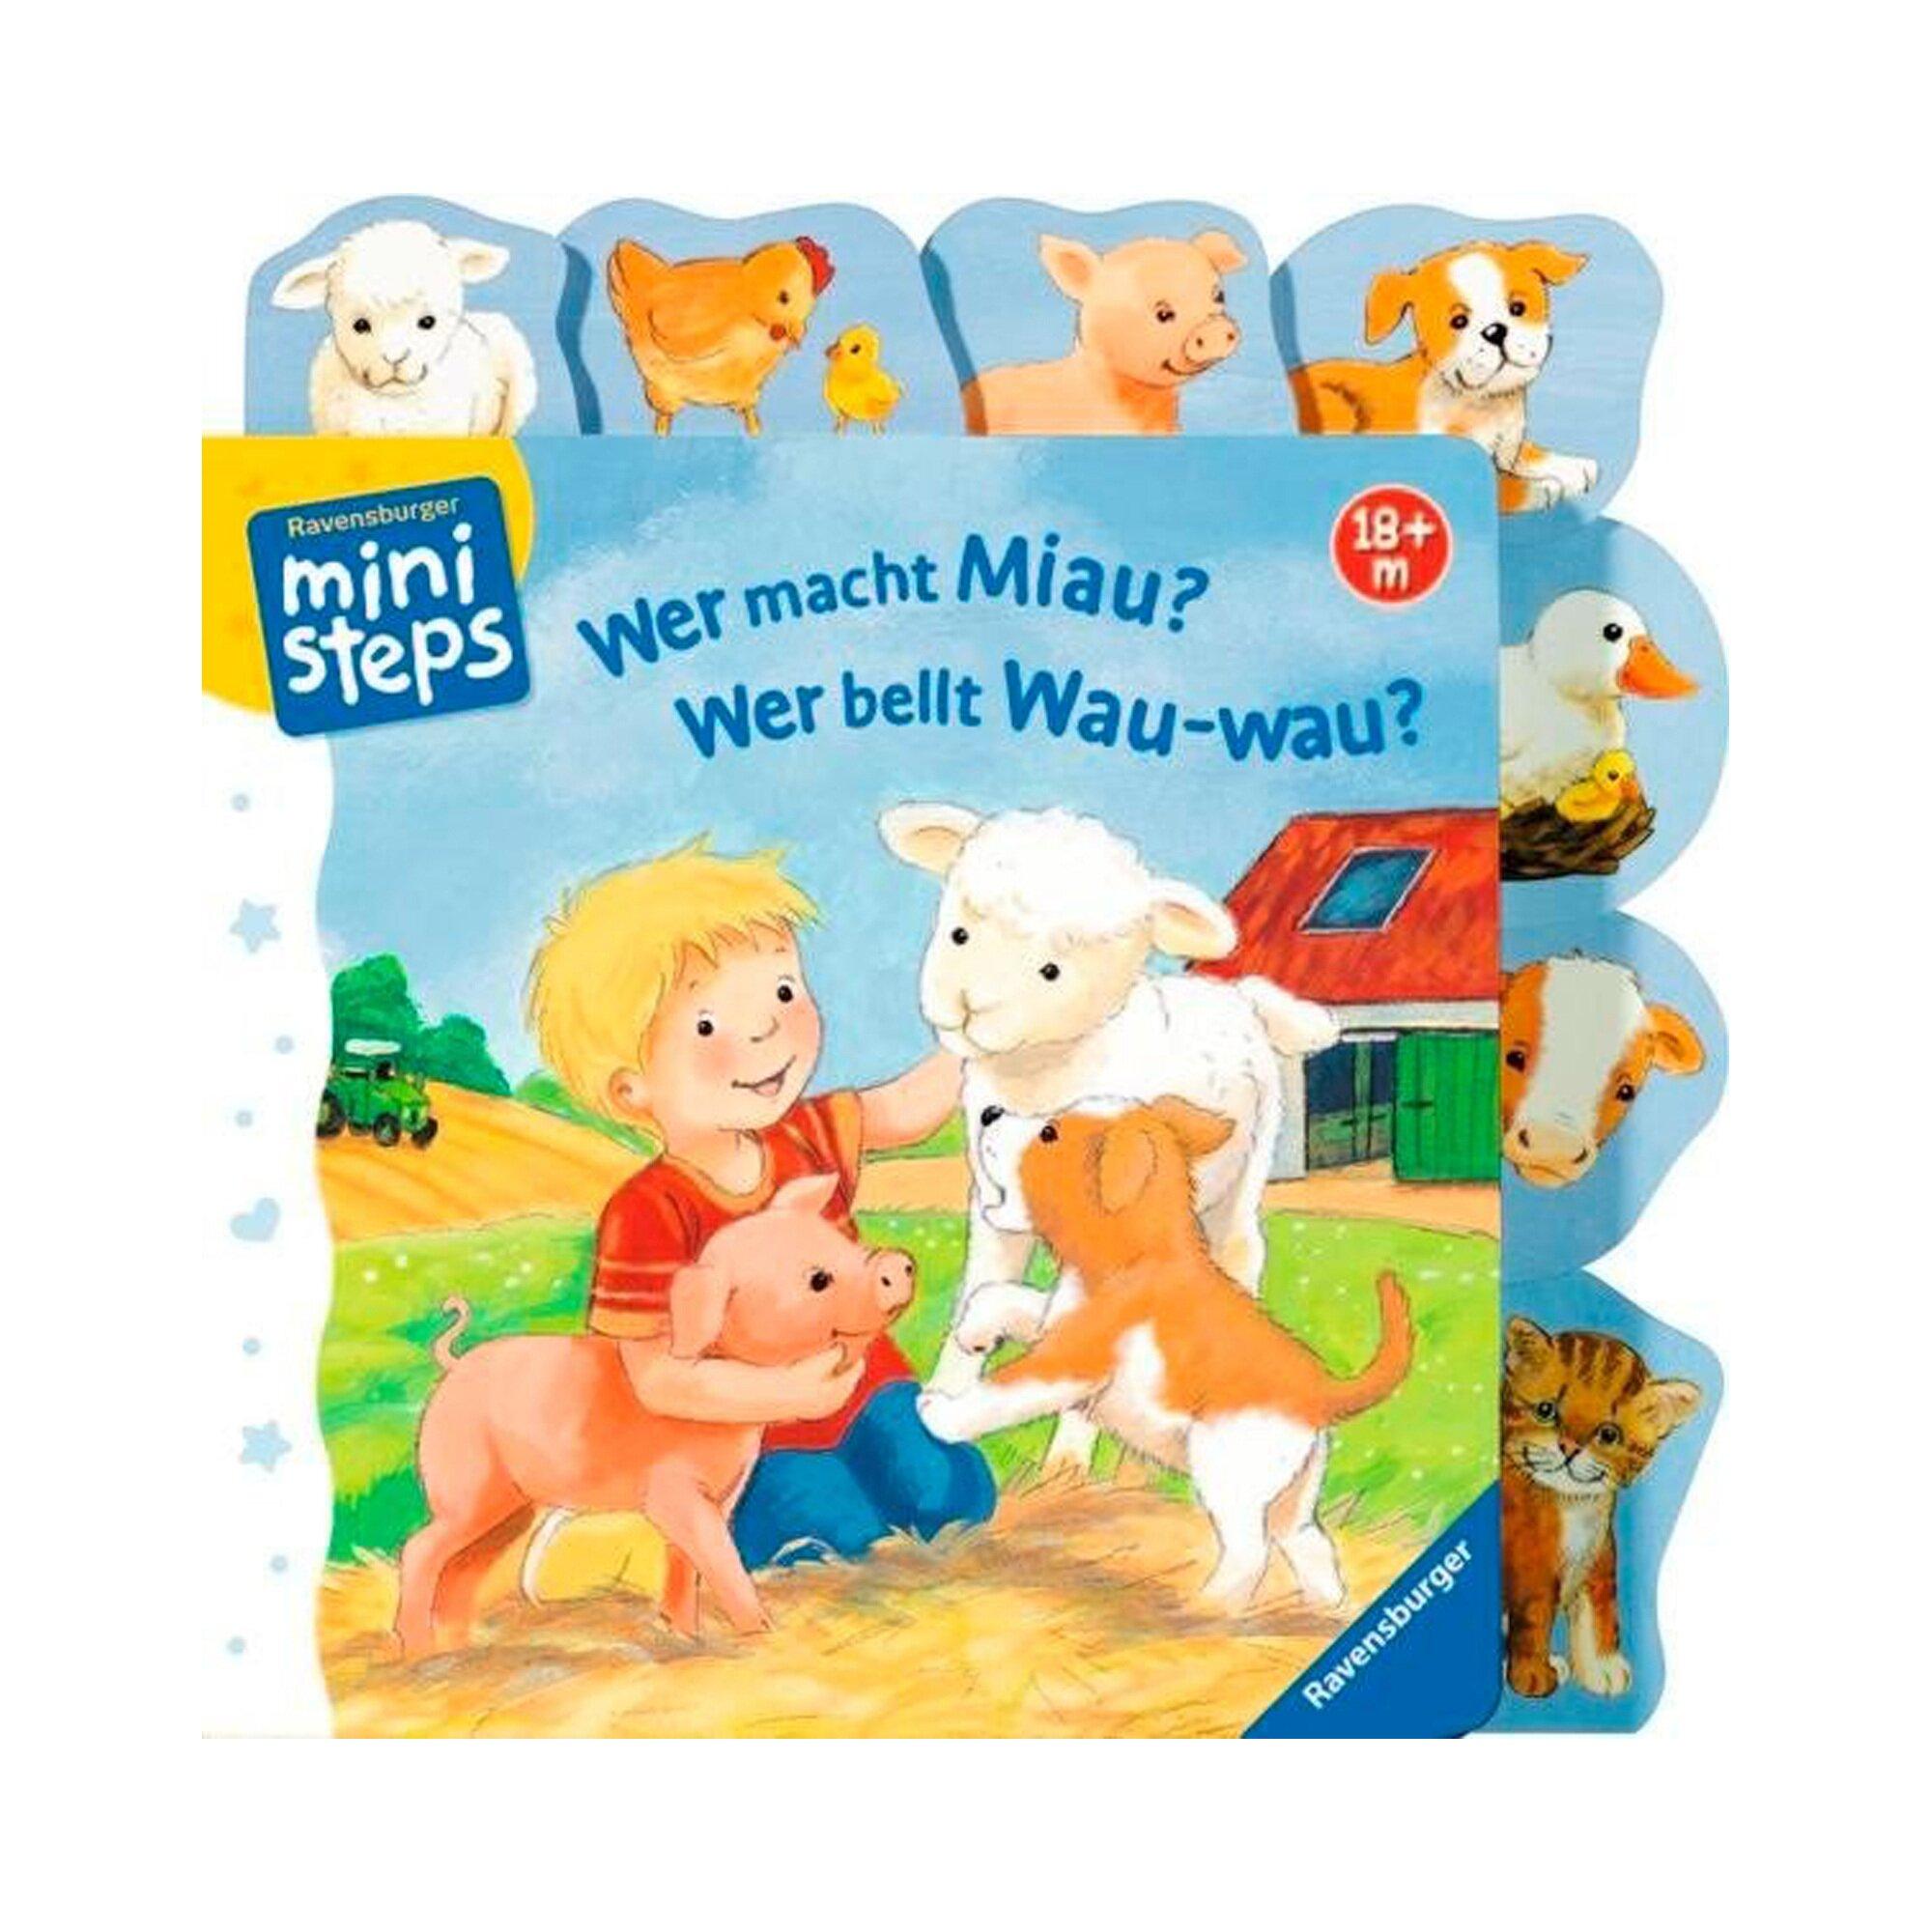 Ministeps Pappbilderbuch Wer macht Miau? Wer bellt Wau-wau?